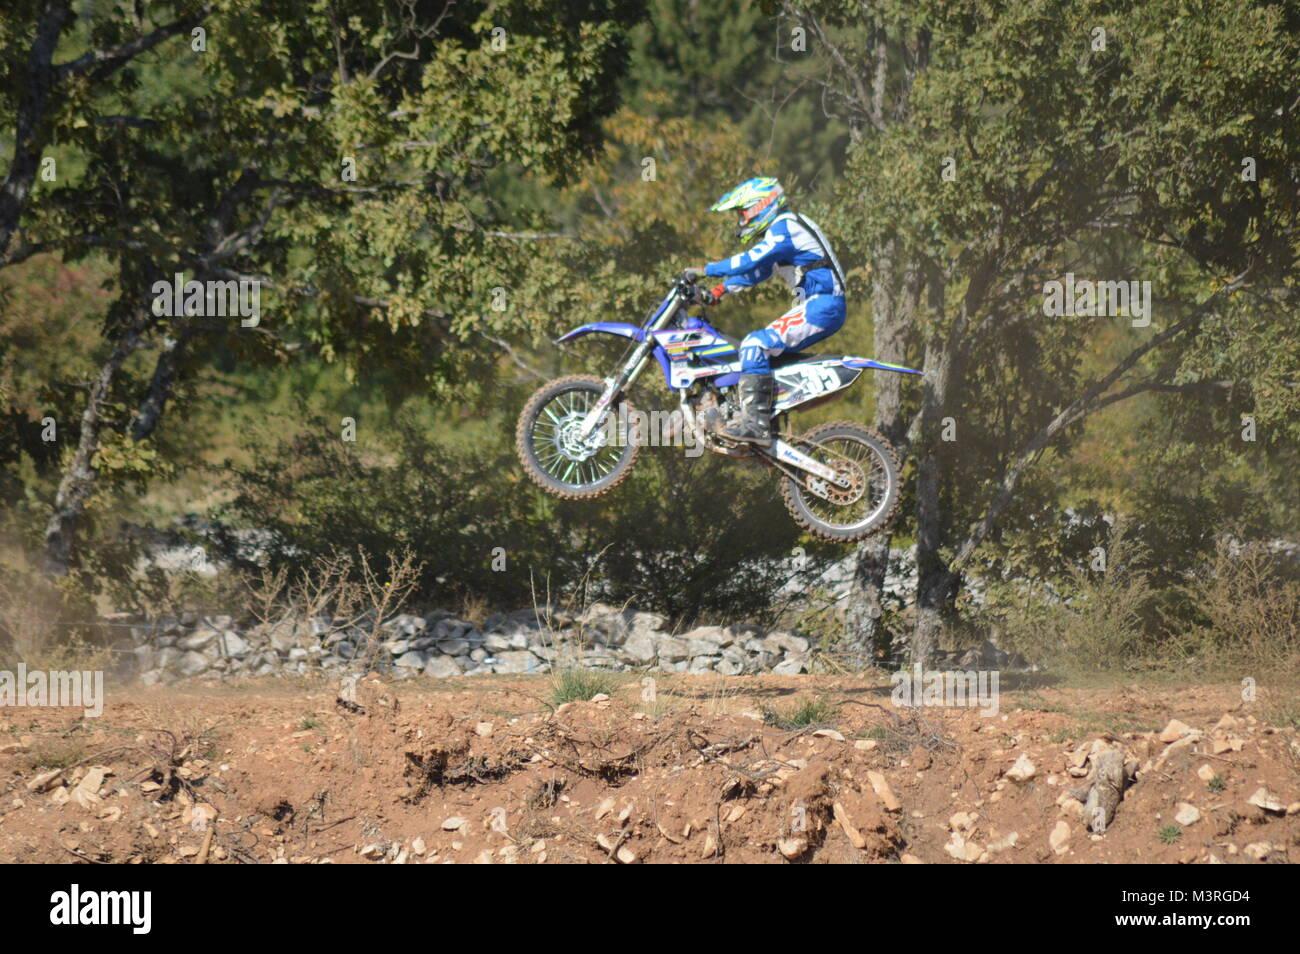 Motocross race - Stock Image